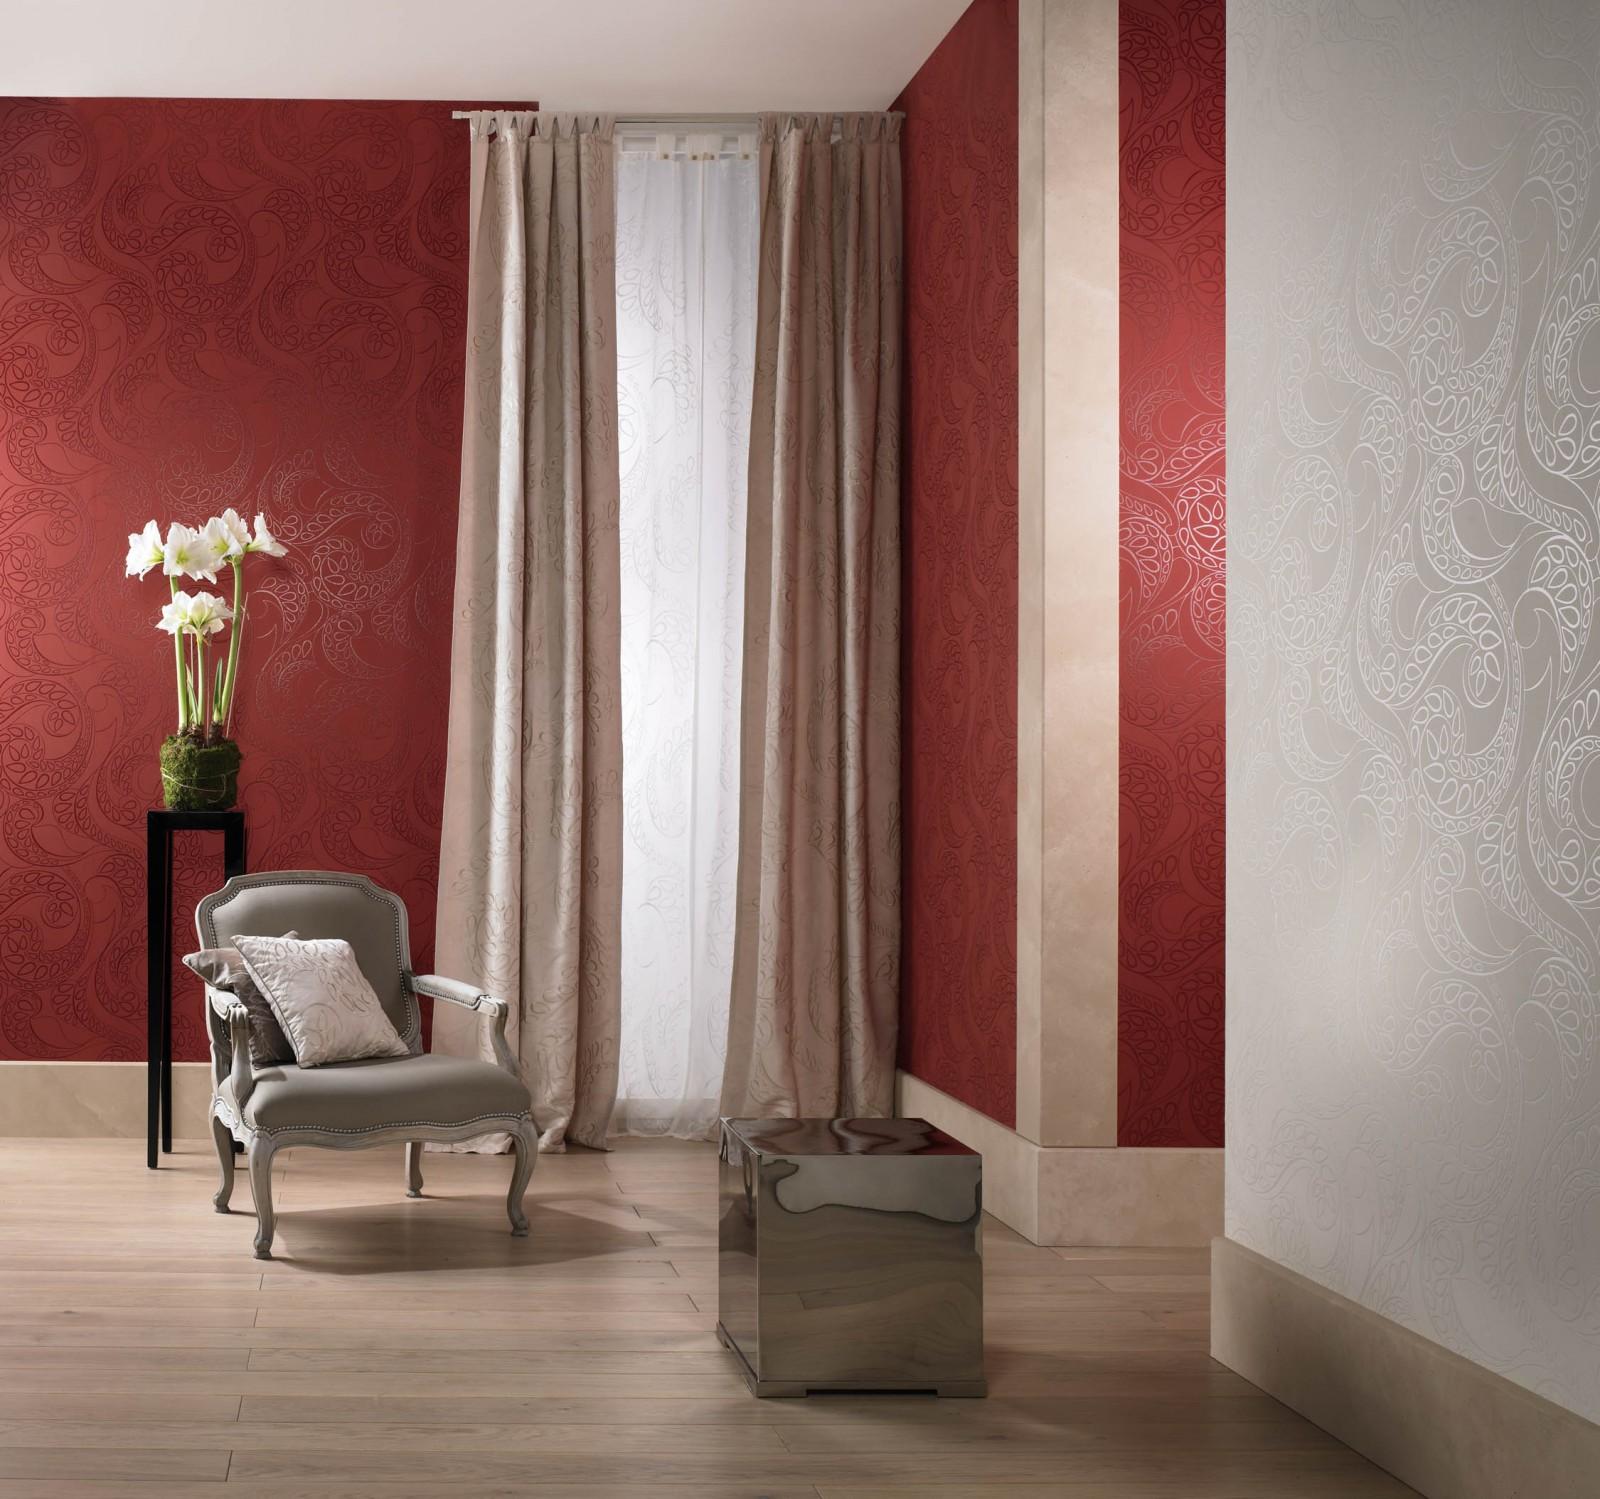 kissenh lle ko tex b b home passion kissenbez ge 48x48 floral stickerei in 2 farben. Black Bedroom Furniture Sets. Home Design Ideas